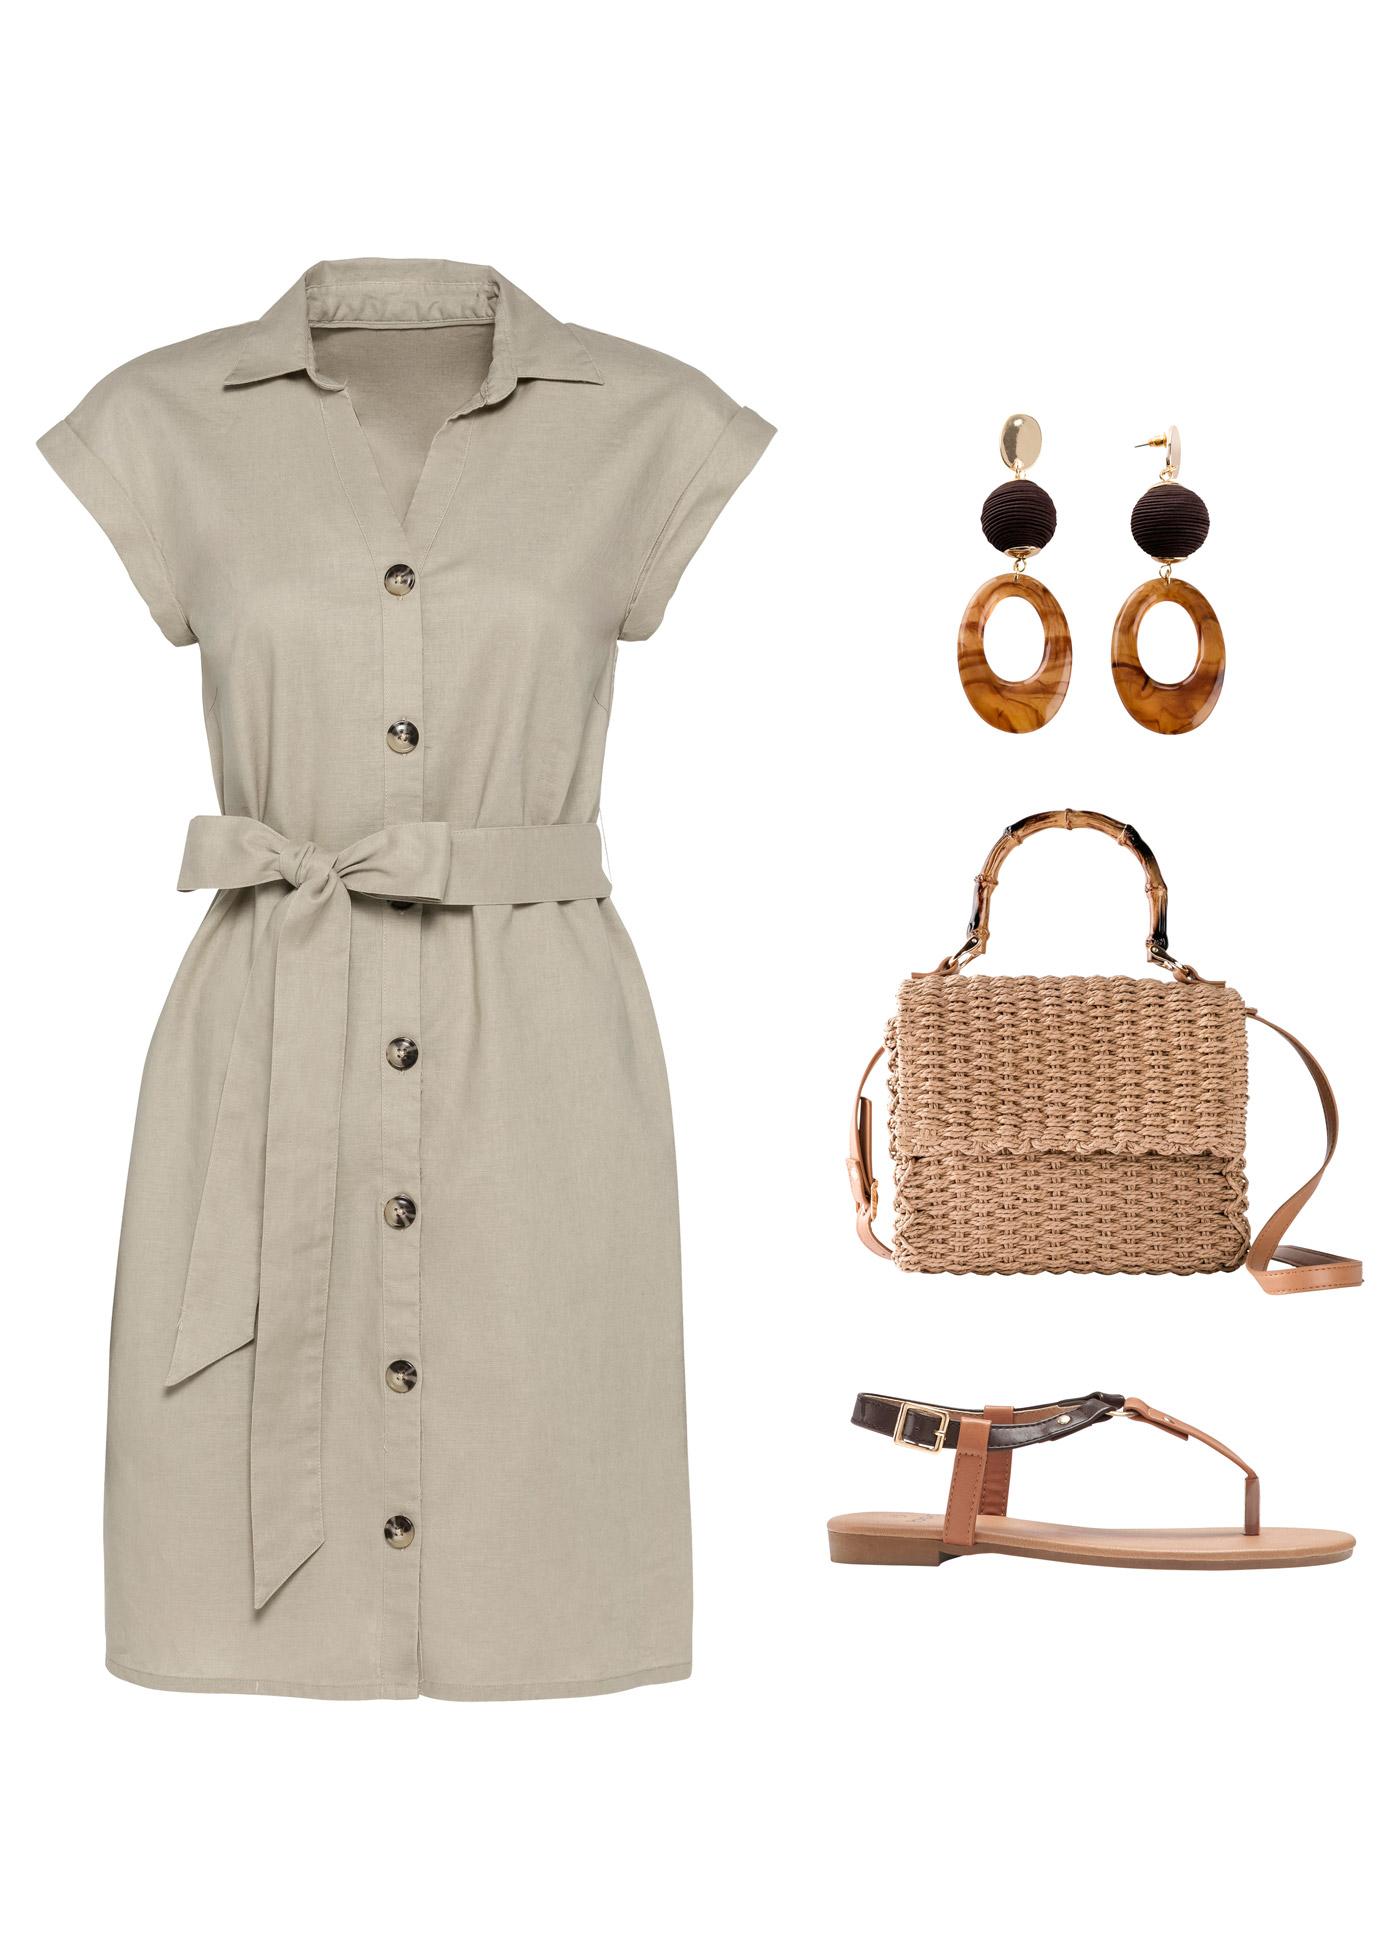 Leinen-Kleid, BODYFLIRT